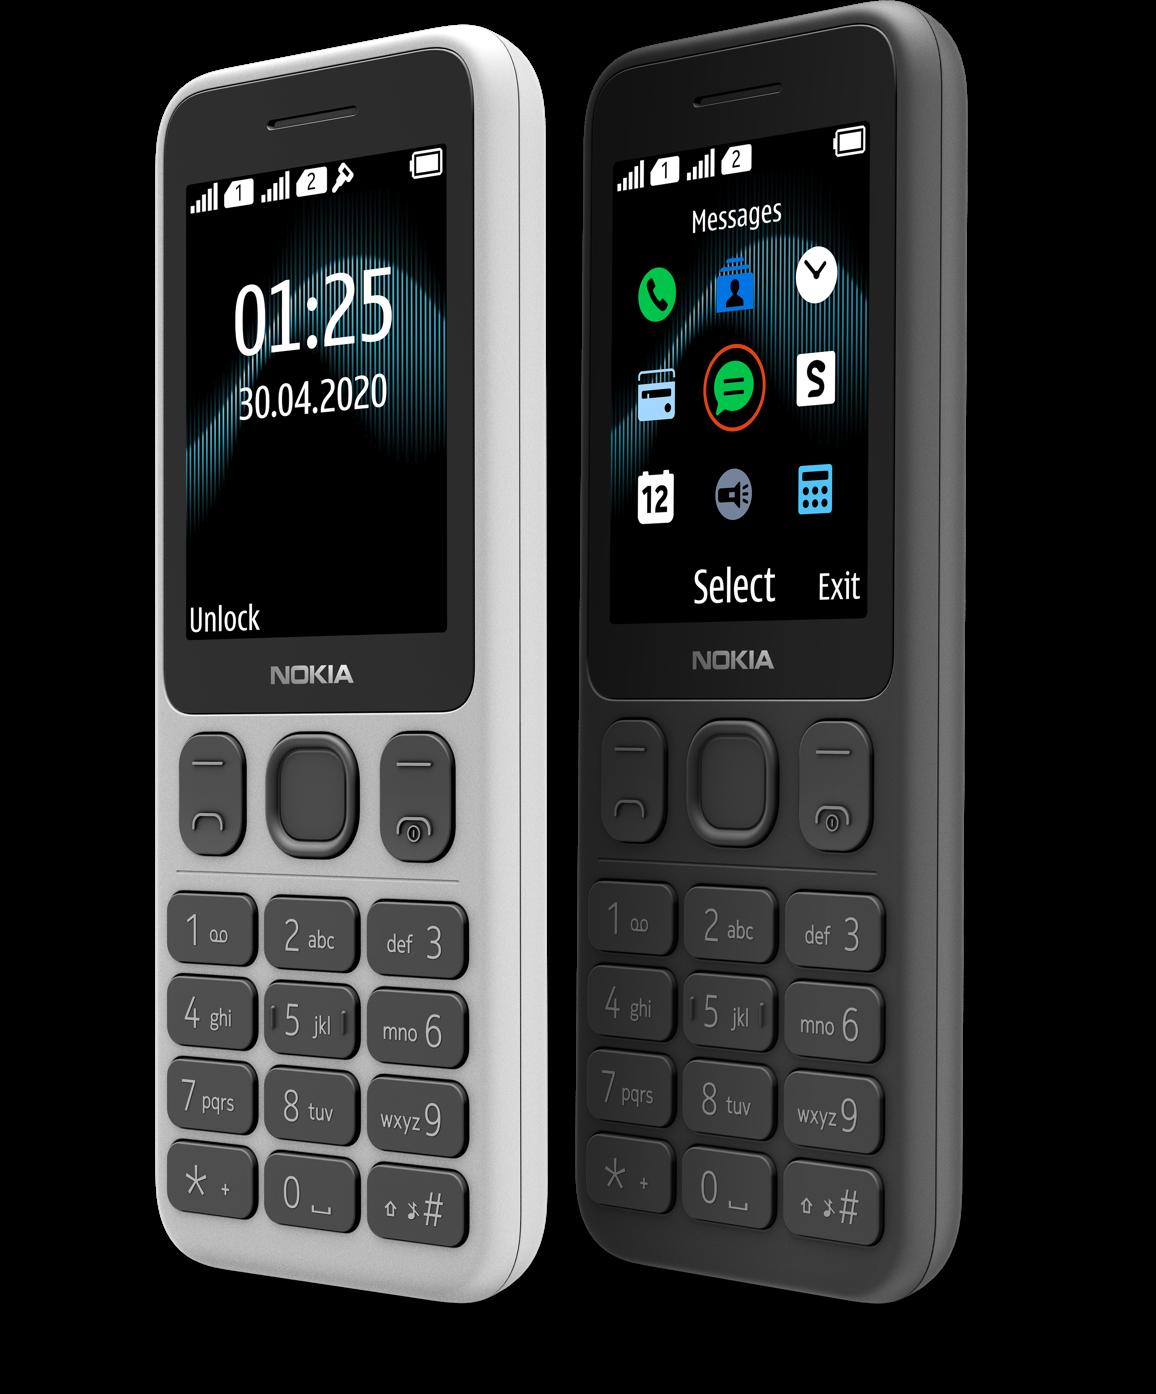 125 nokia 125 mobile phone with wireless fm radio nokia phones 125cc motorcycle 125 mobile phone with wireless fm radio